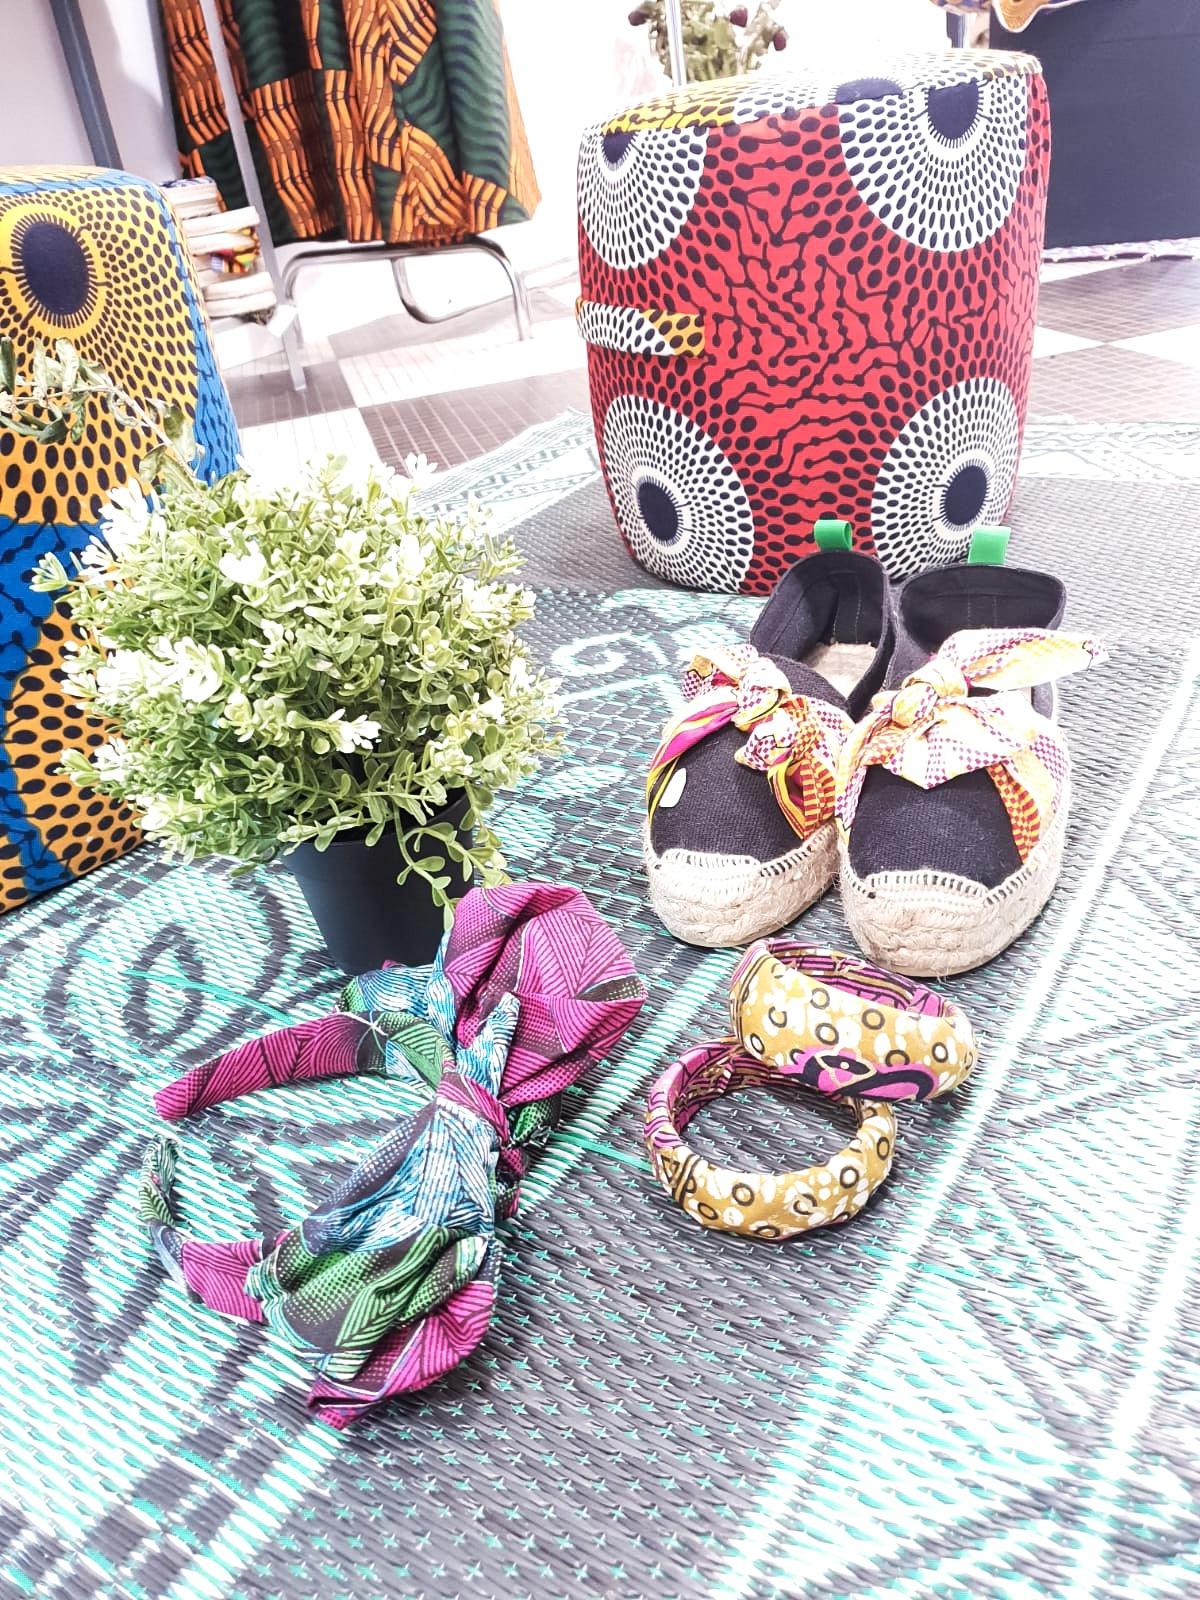 deco tabouret boutique Leemoa et NouryJPG